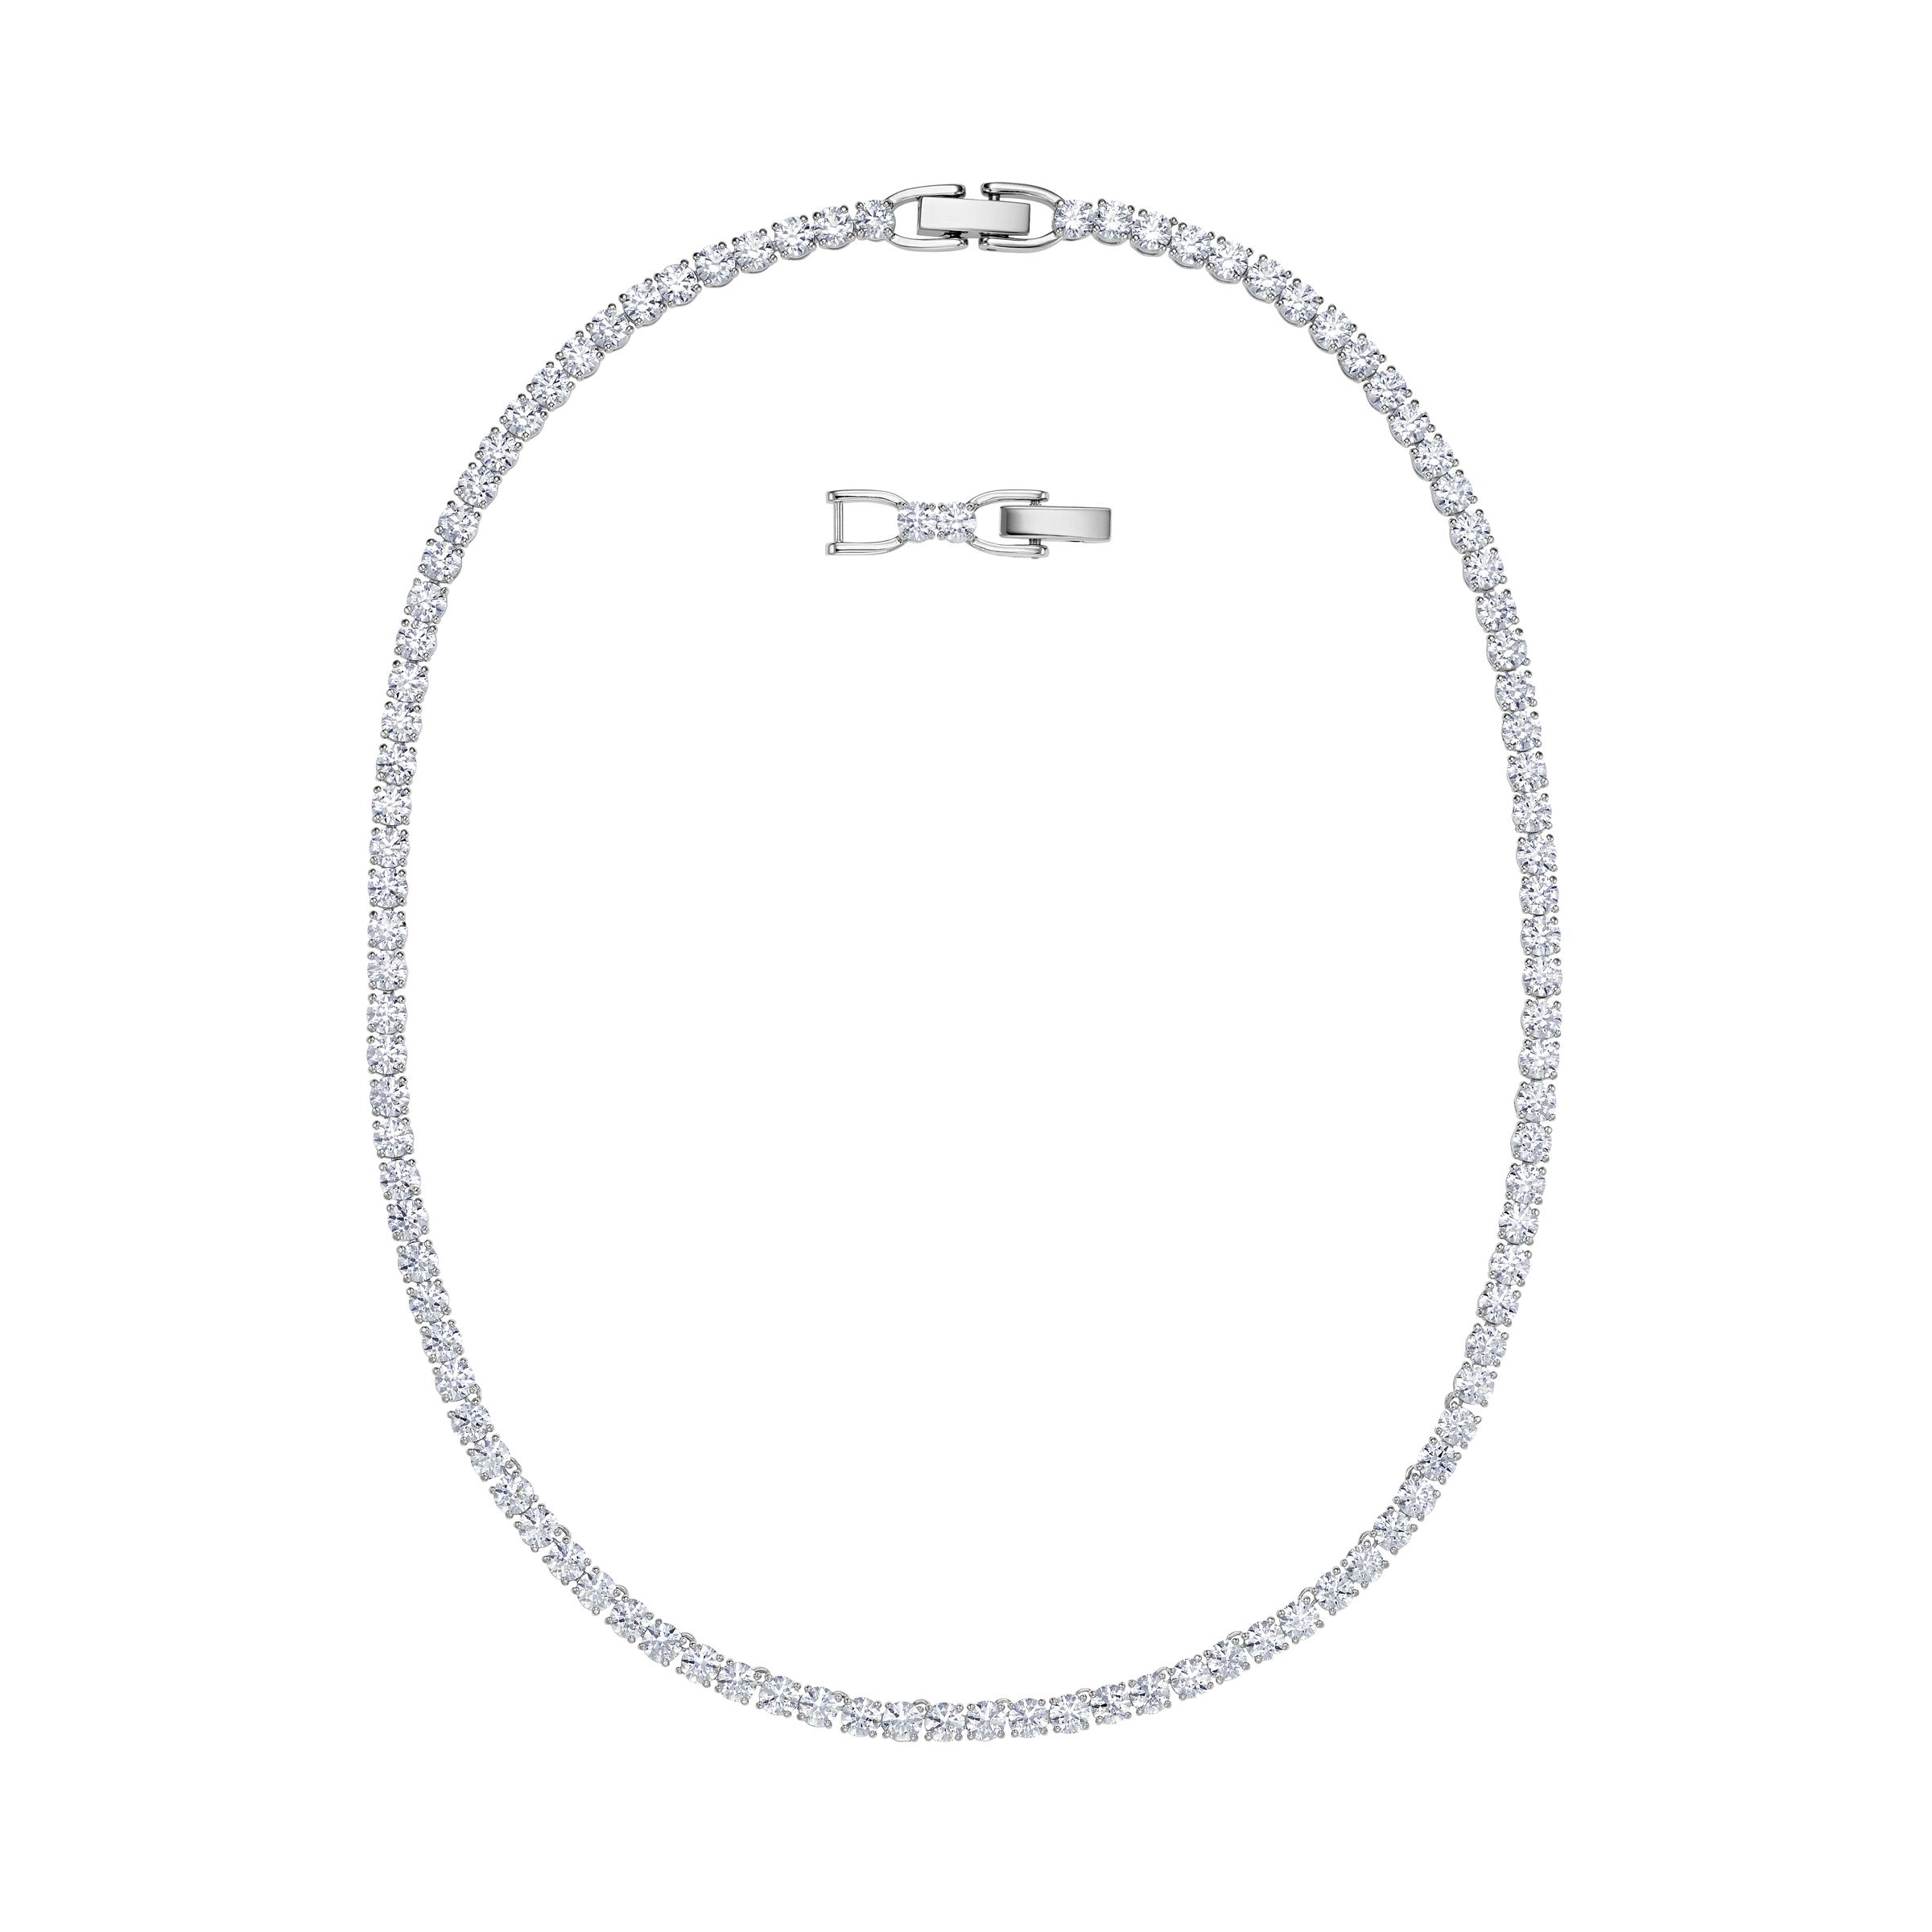 Collier Tennis Deluxe, blanc, Métal rhodié, Swarovski